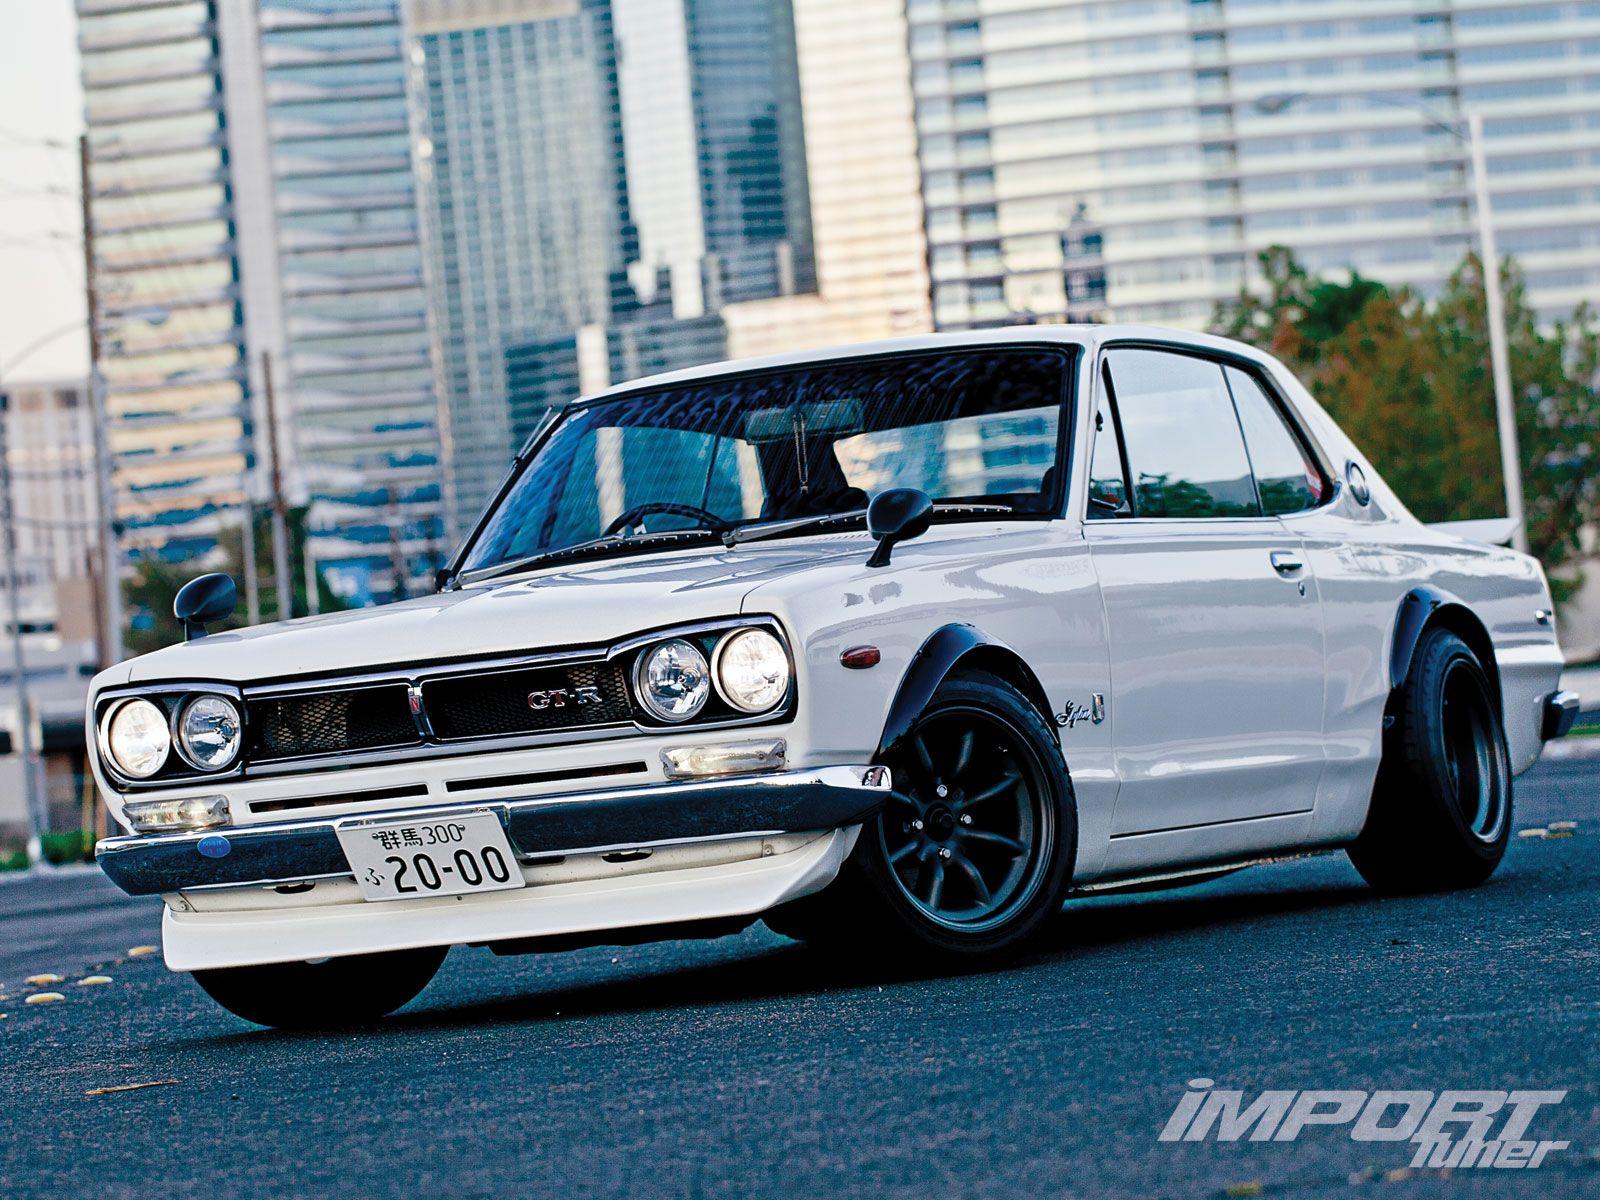 top-old-school-chassis-1972-nissan-skyline-hakosuka ...  1972 Nissan Skyline Jdm